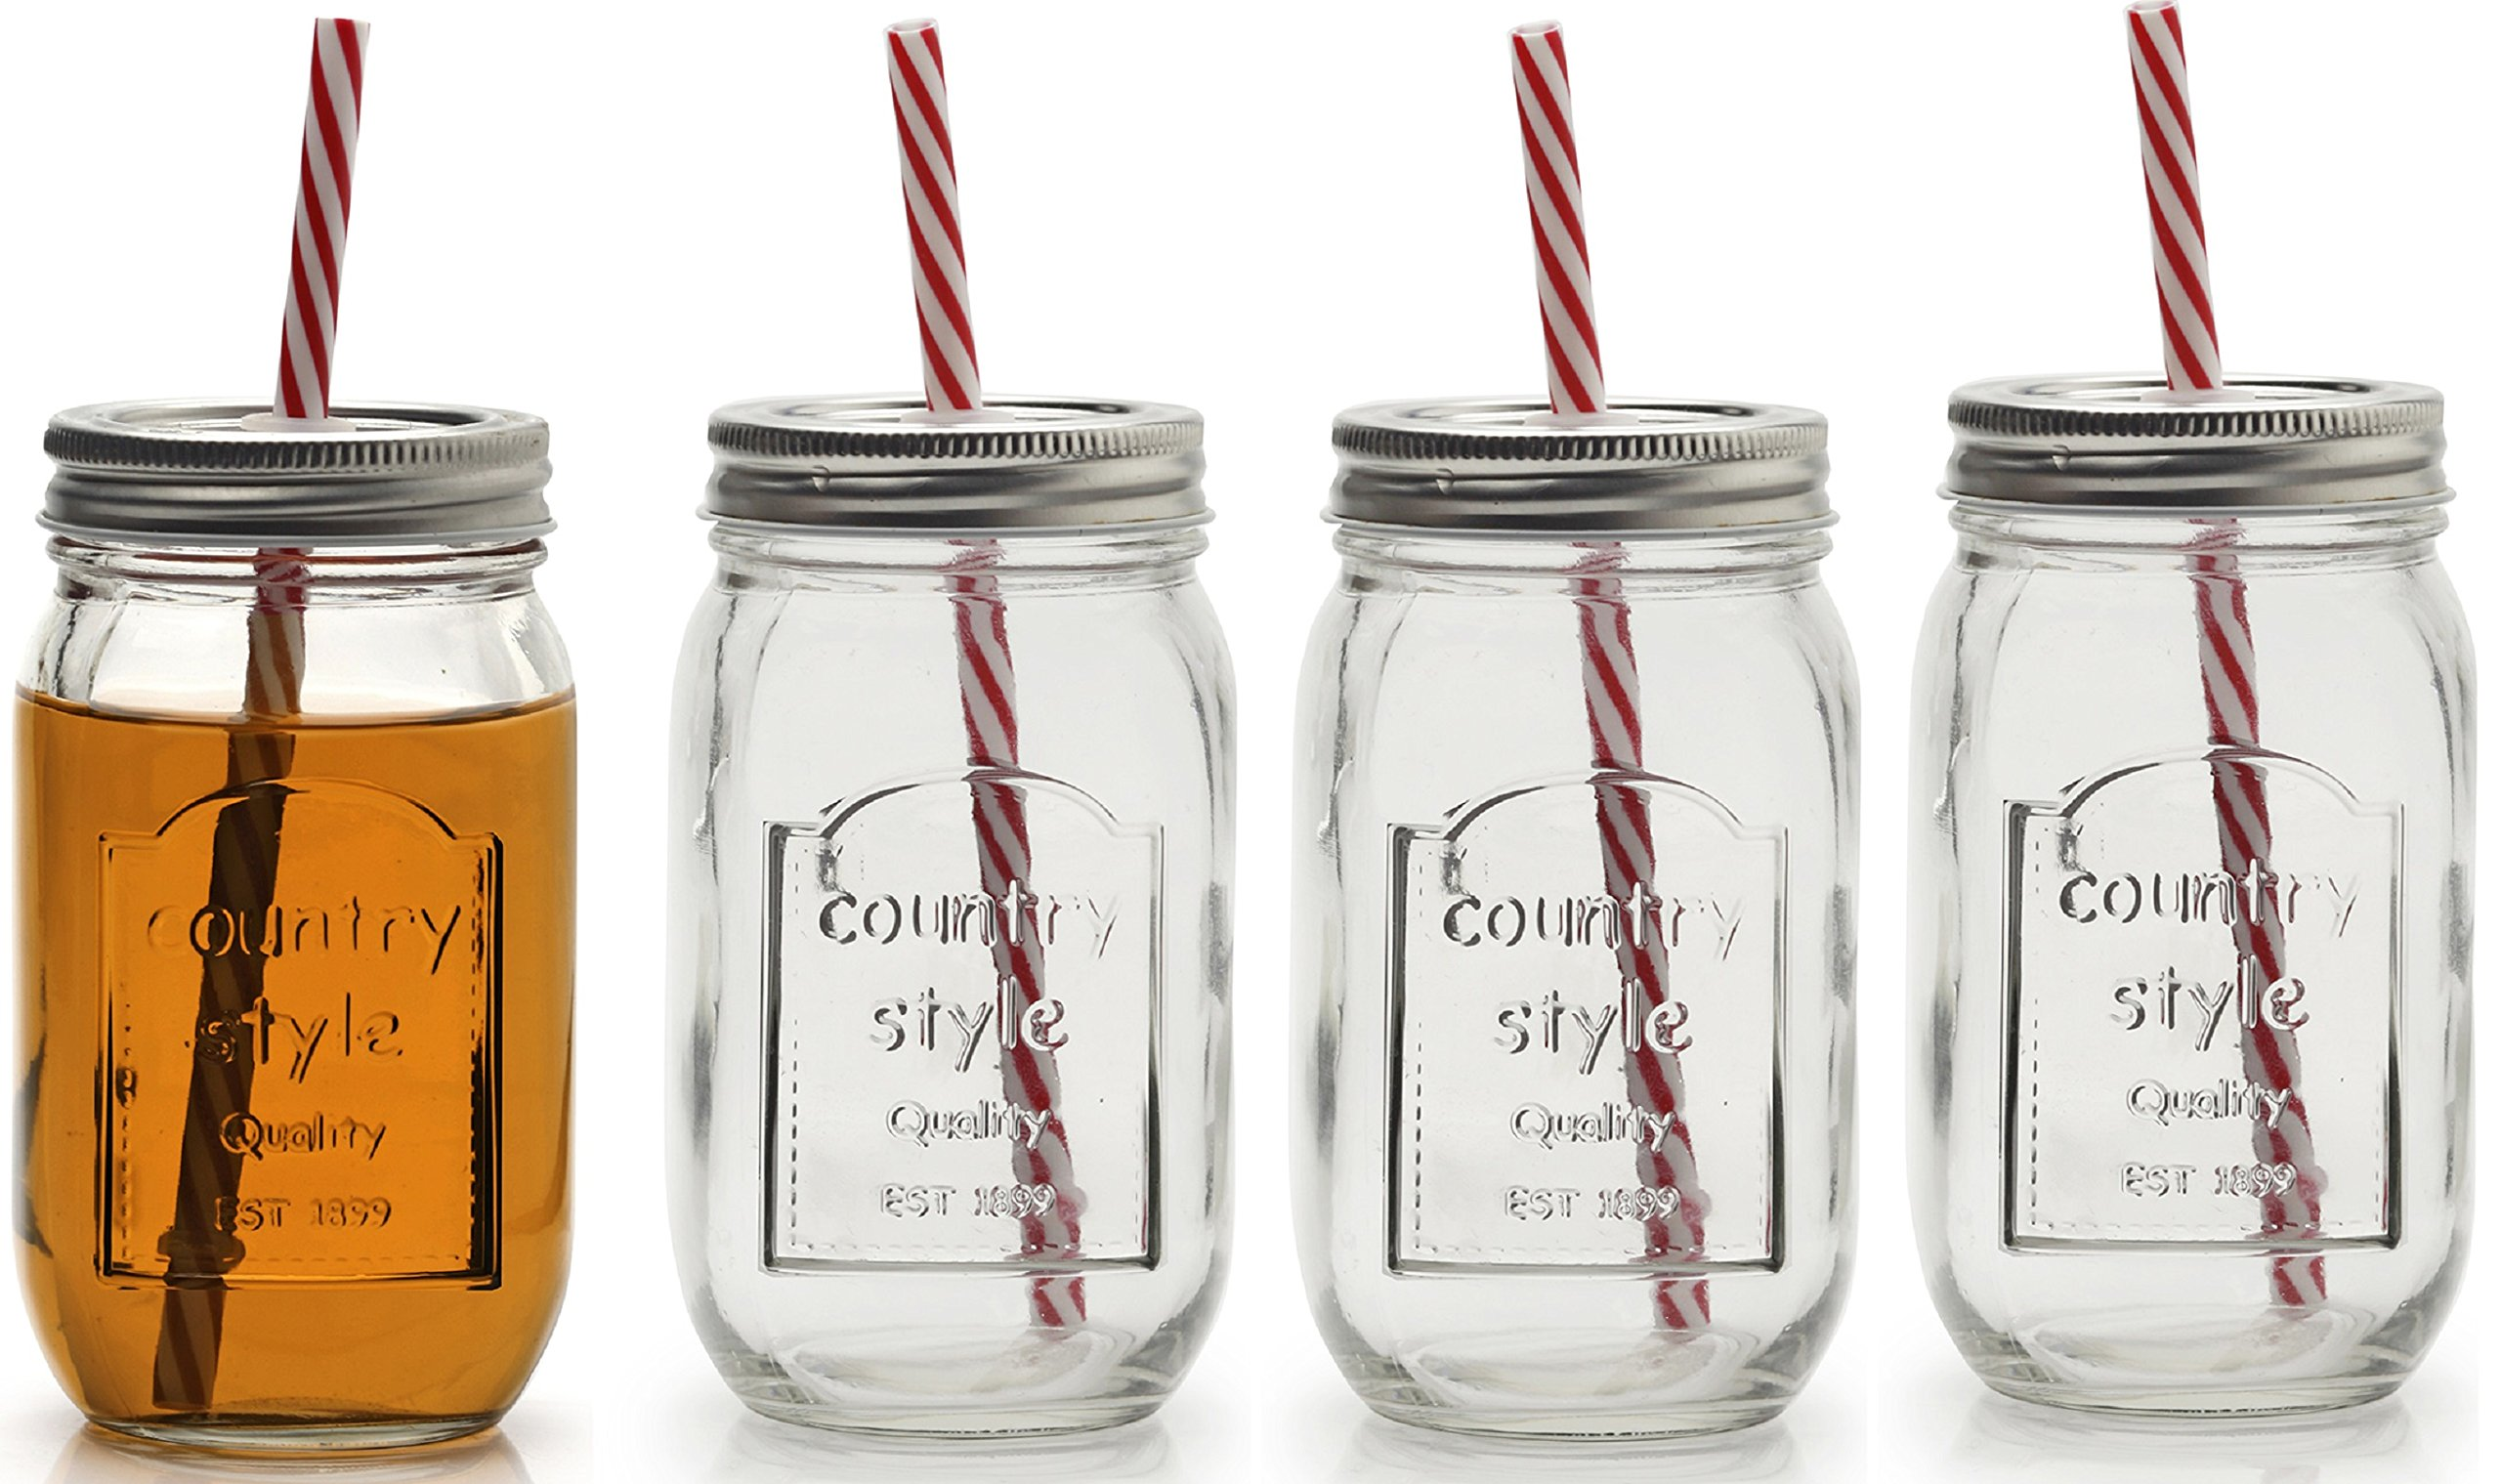 Circleware 67025 Country Mason Jar Mug Beverage Drinking Glasses with Metal Lids & Straws, 16 oz, Mason Chalkboard Jars with Lids And Straws